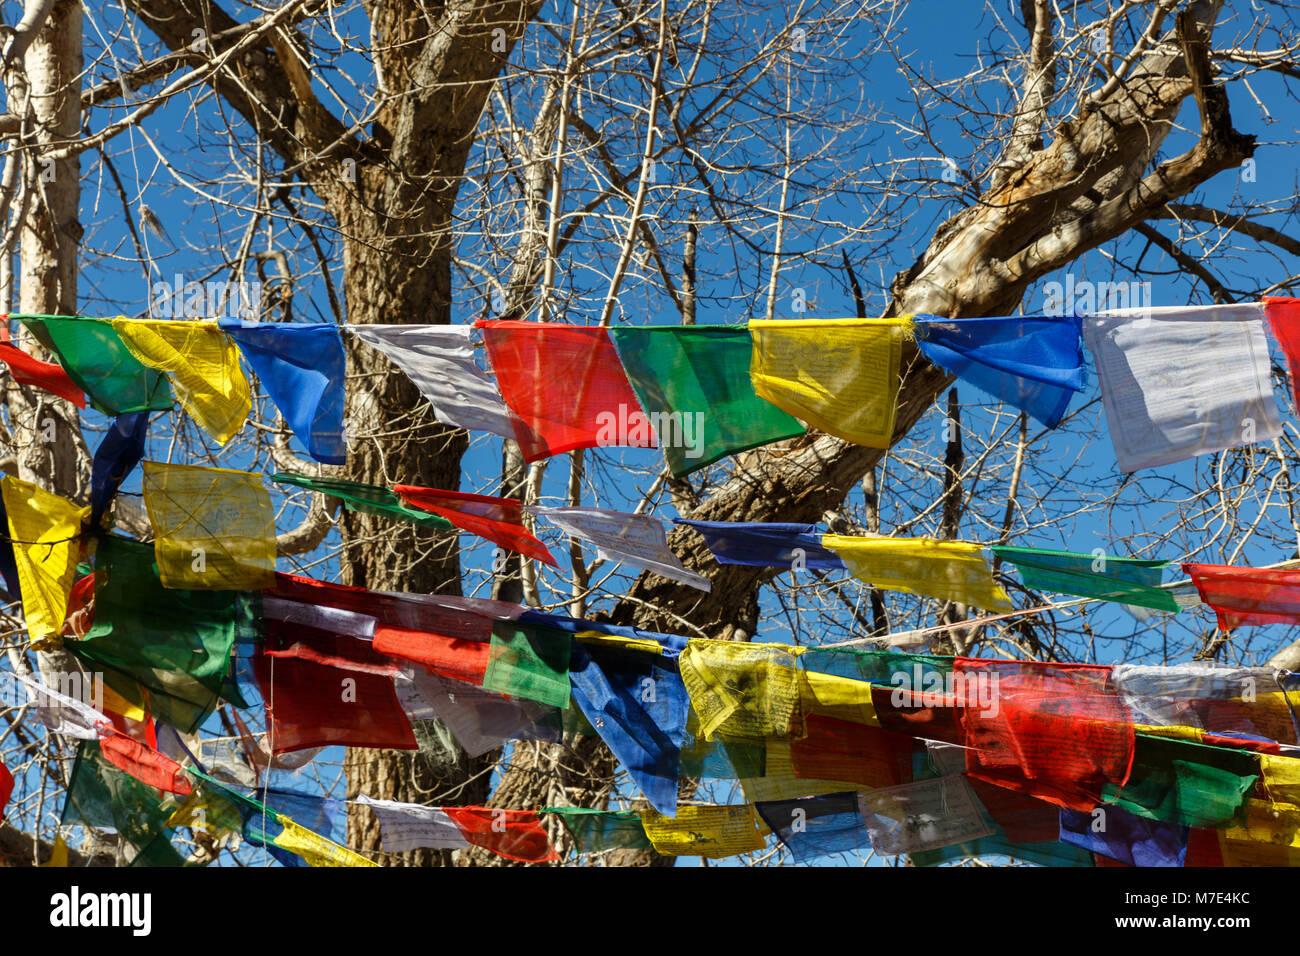 Buddhist prayer flags on a tree, Muktinath, Nepal - Stock Image